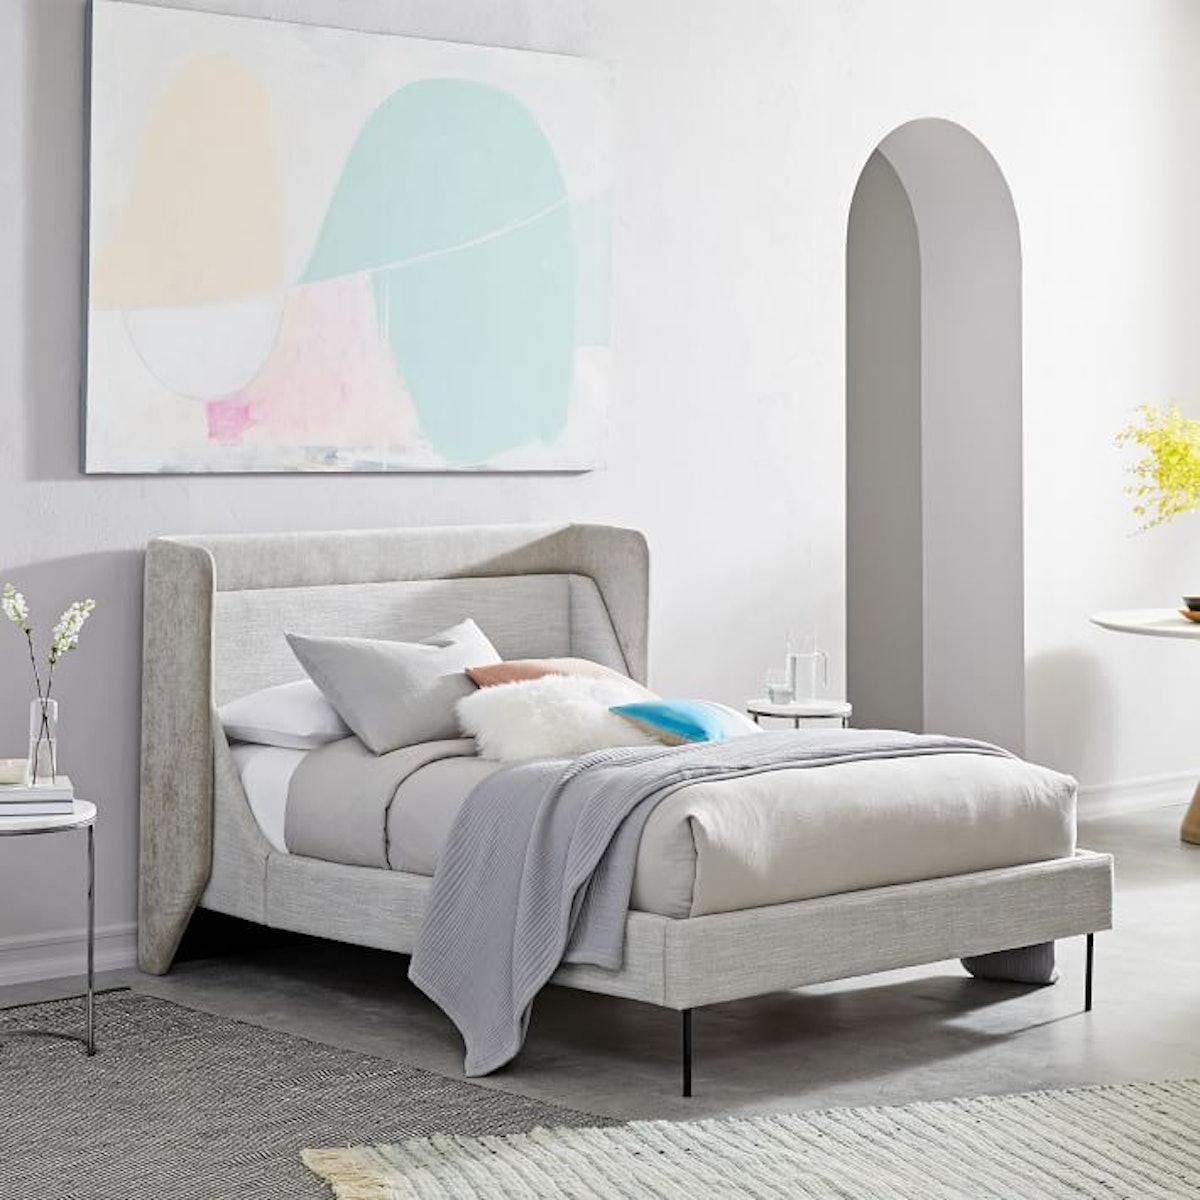 Thea Wing Bed, Queen